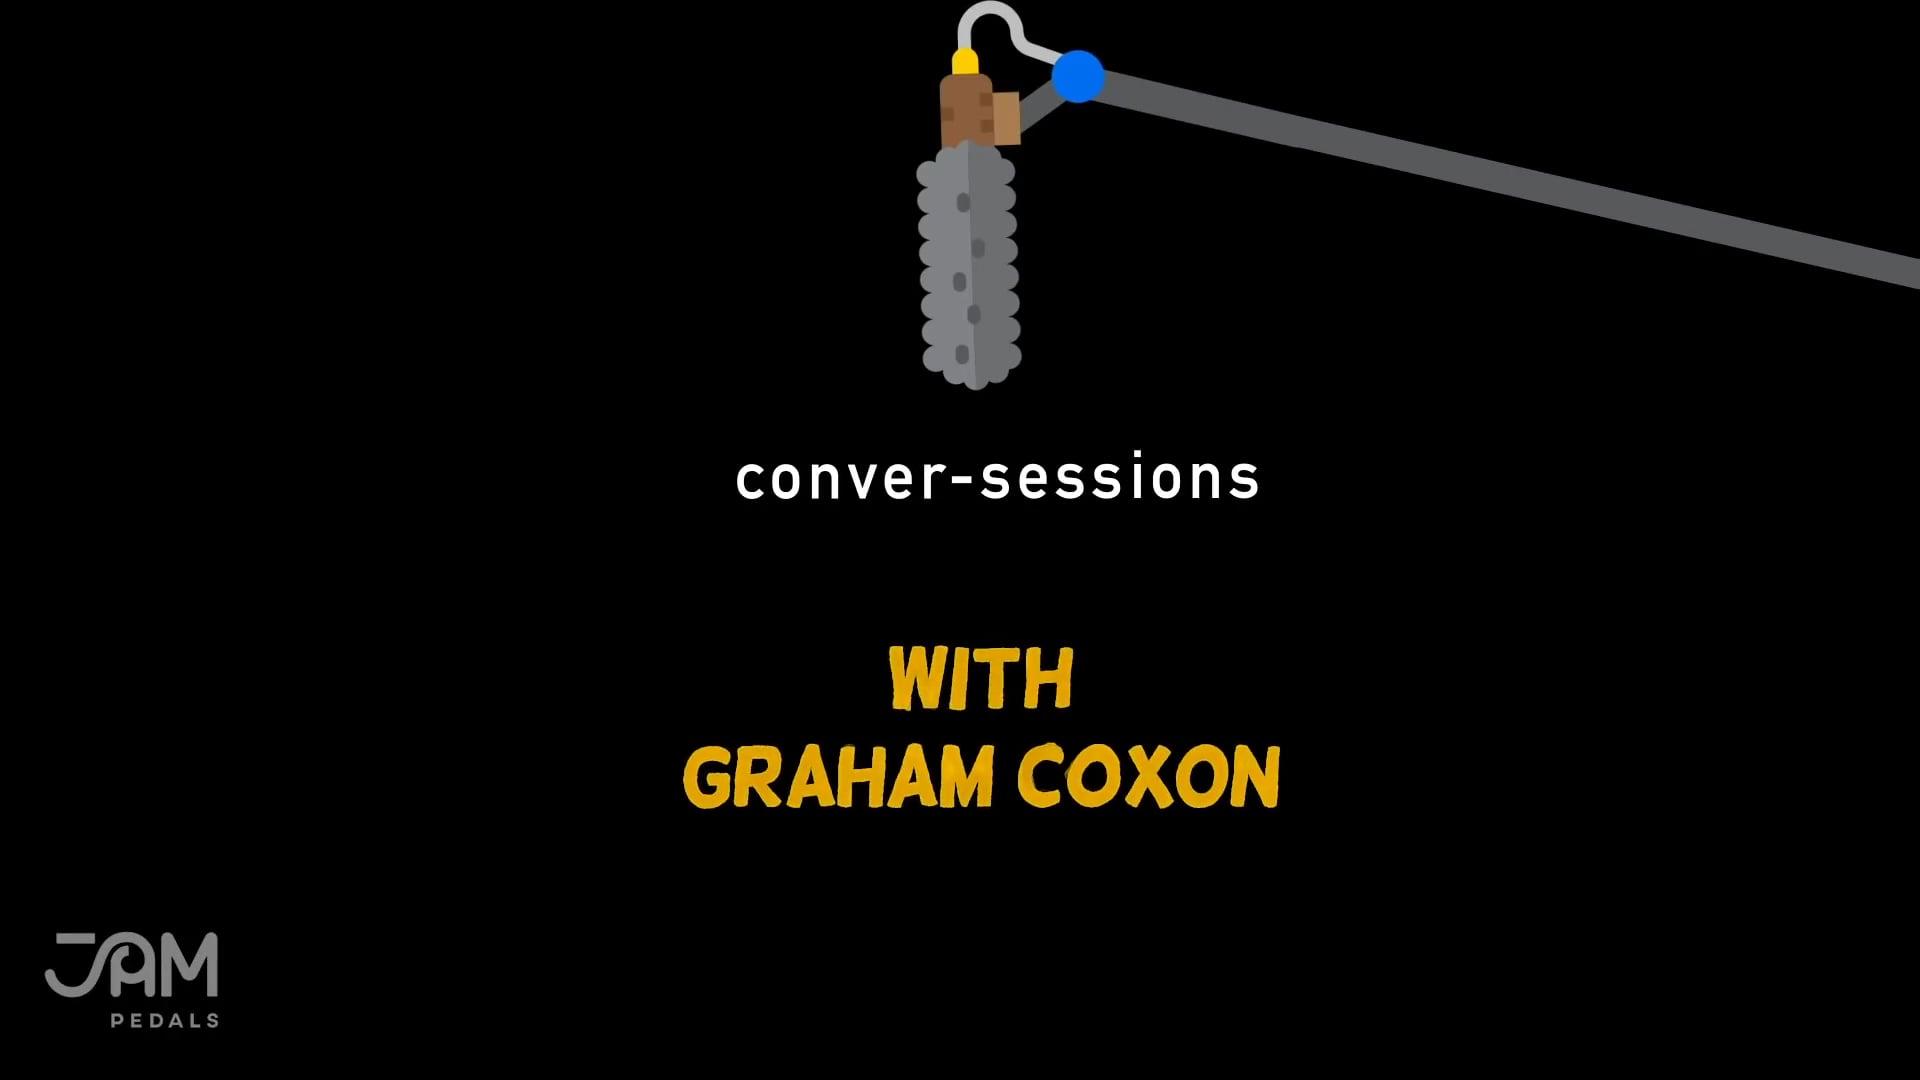 A Conver-Session with Graham Coxon  JAM pedals